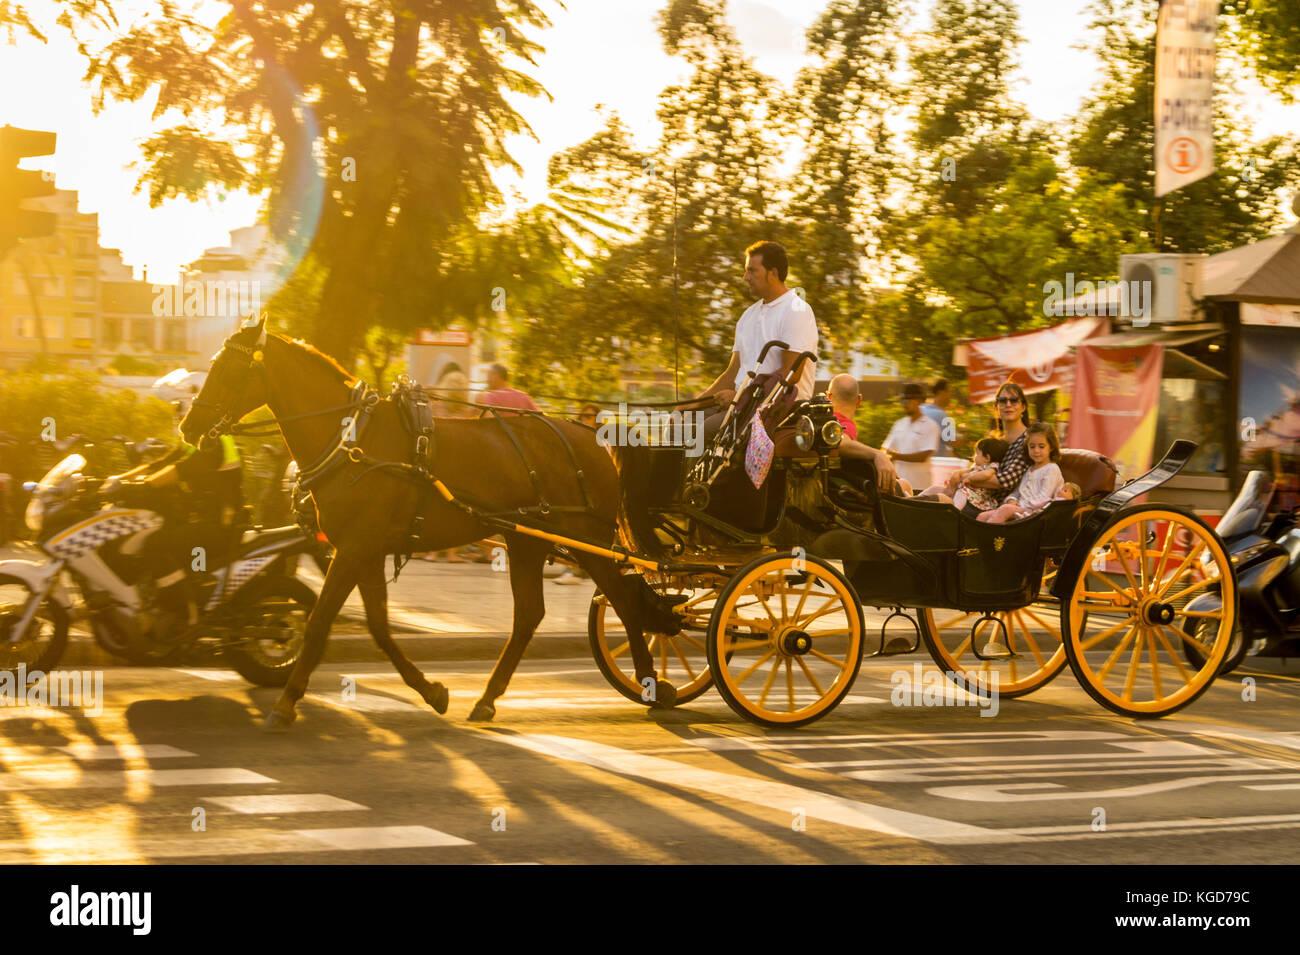 horse-drawn-landau-carriage-with-a-smili